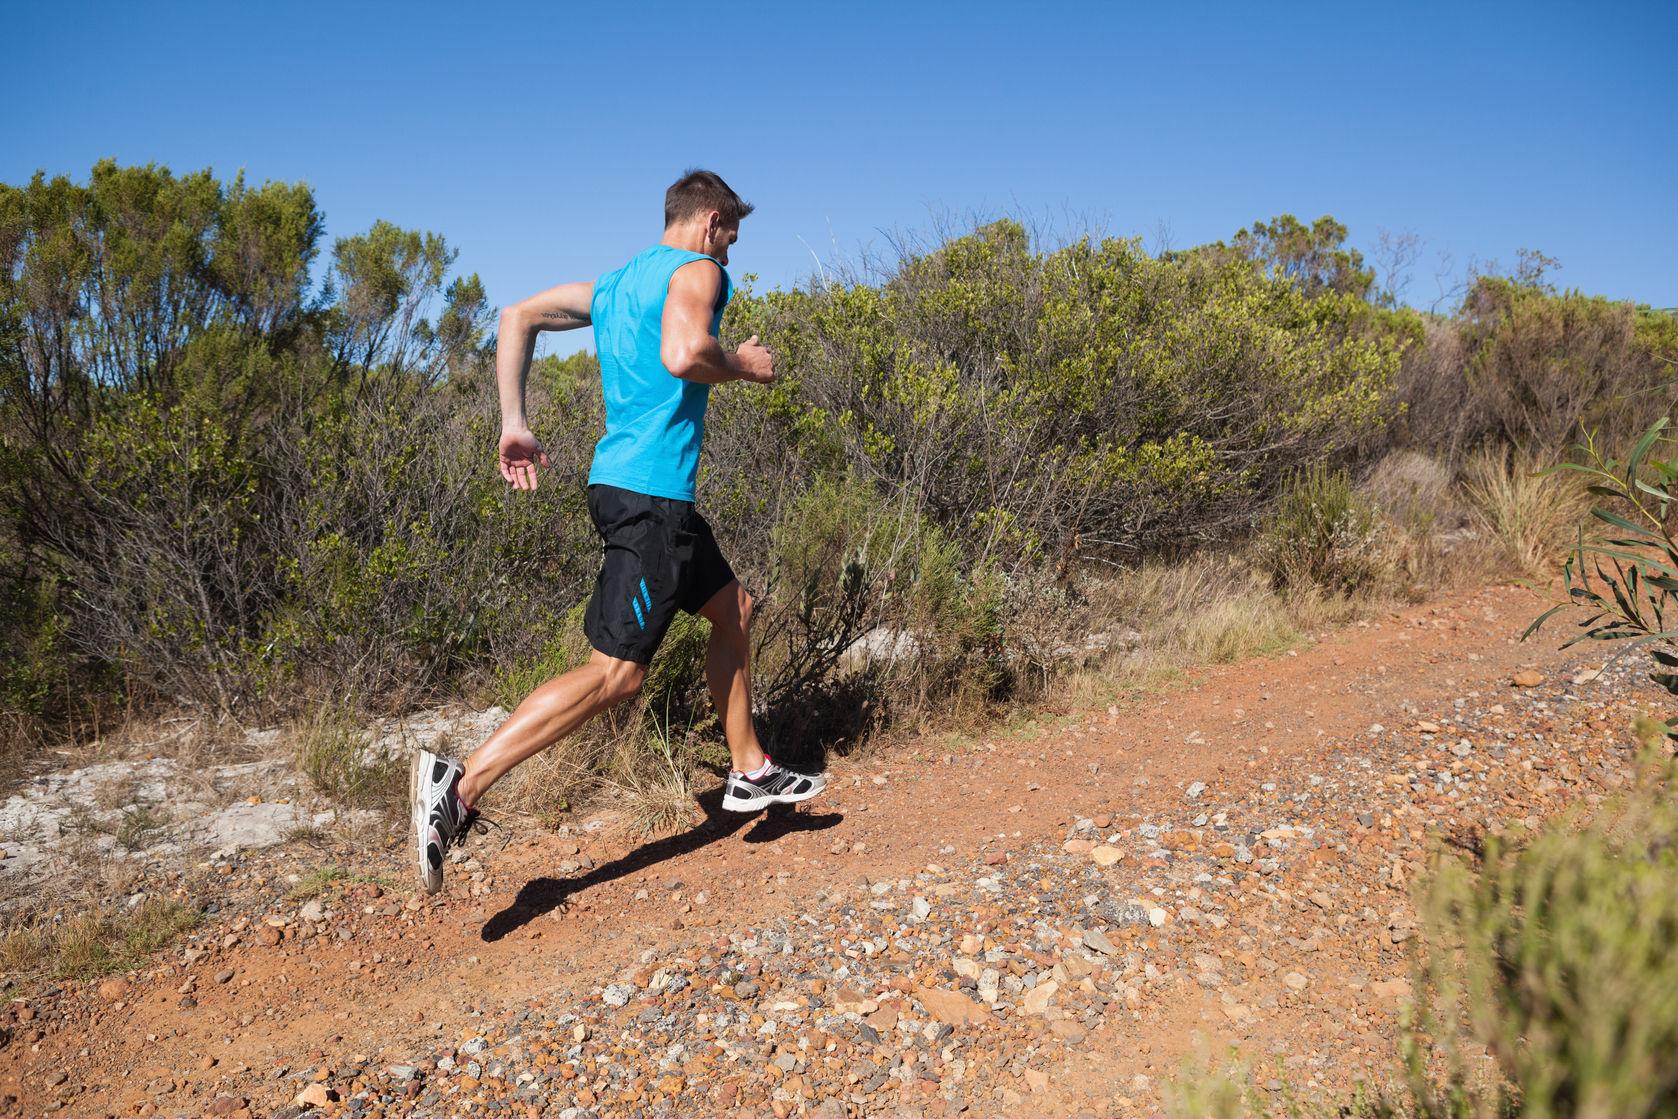 Trail running uphill